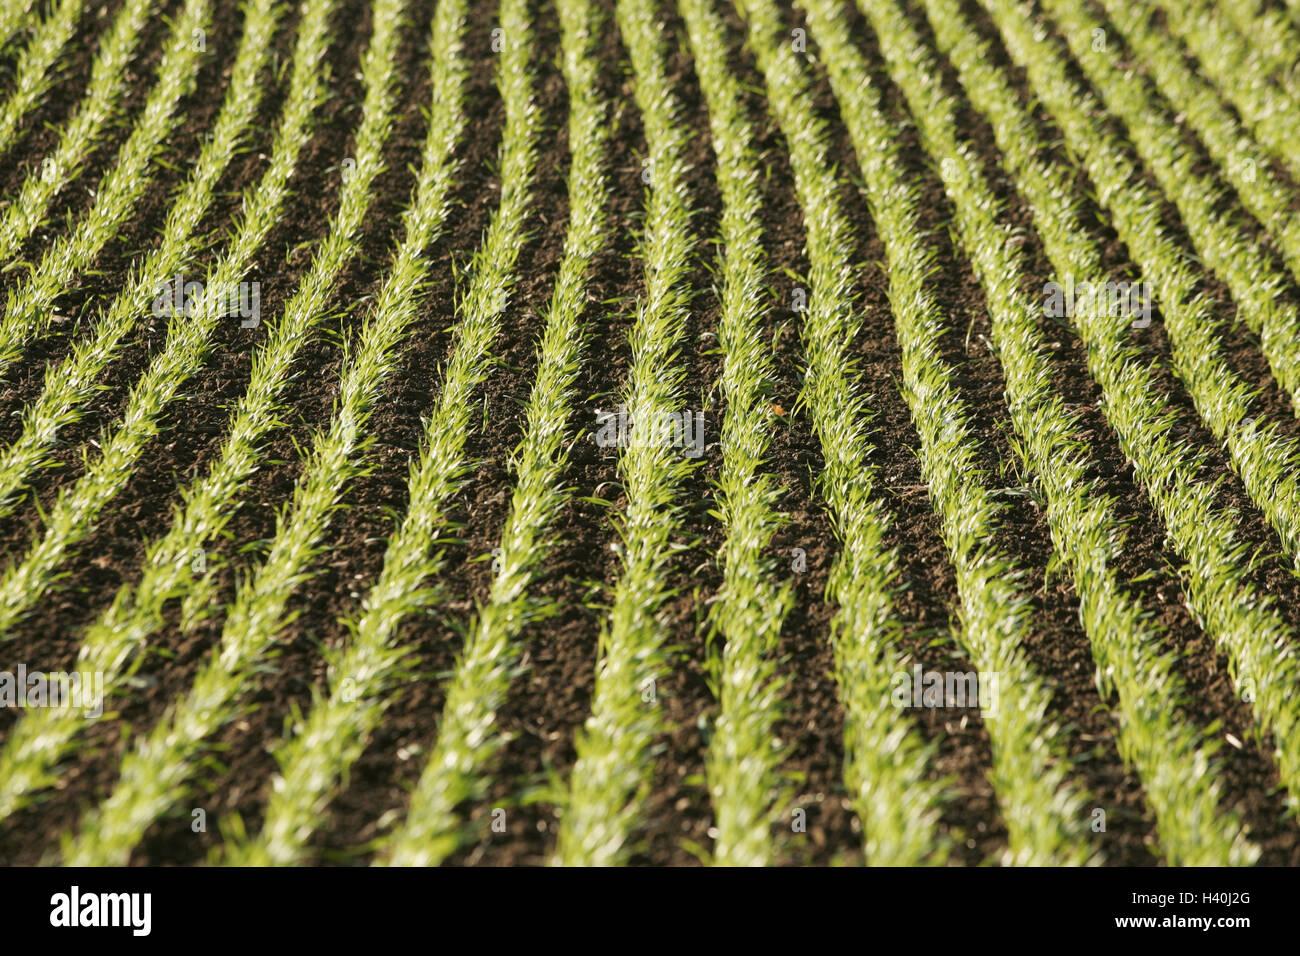 Germany, field, detail, Setzlinge, Europe, field, field economy, agriculture, cultivation, grain, growing grain, - Stock Image